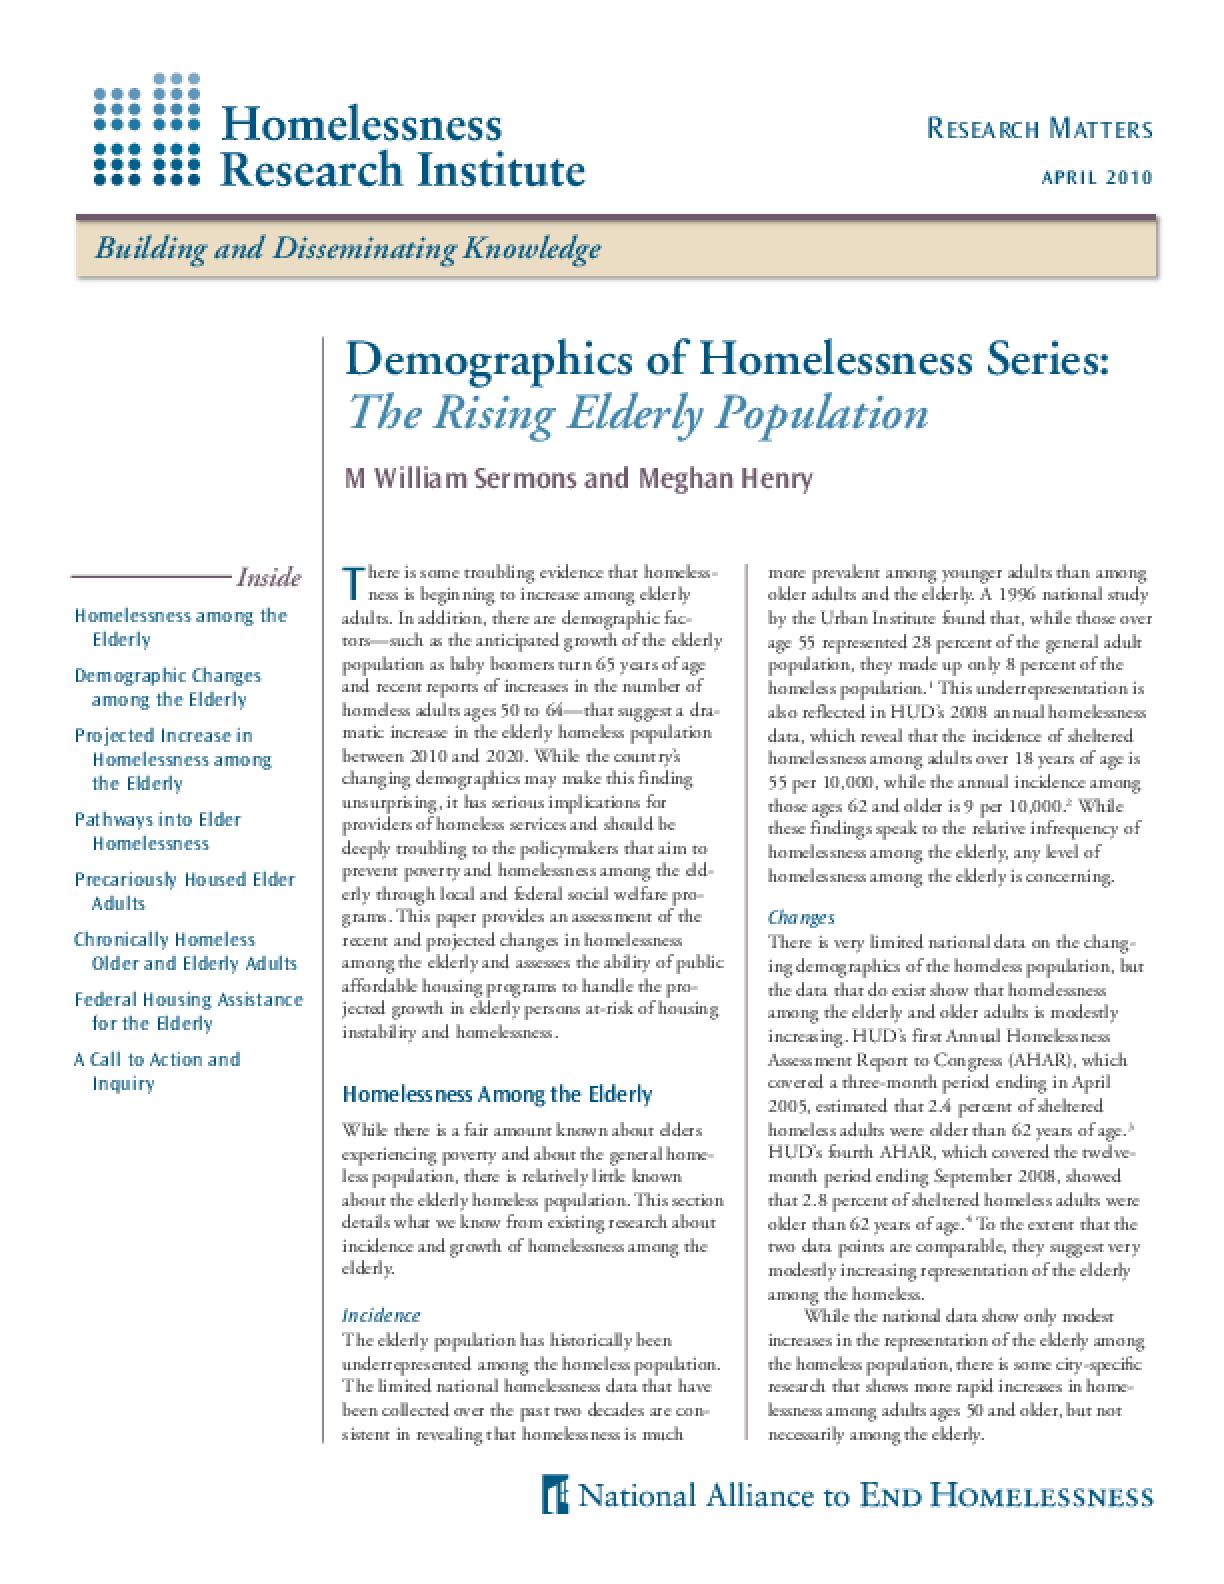 Demographics of Homelessness Series: The Rising Elderly Population